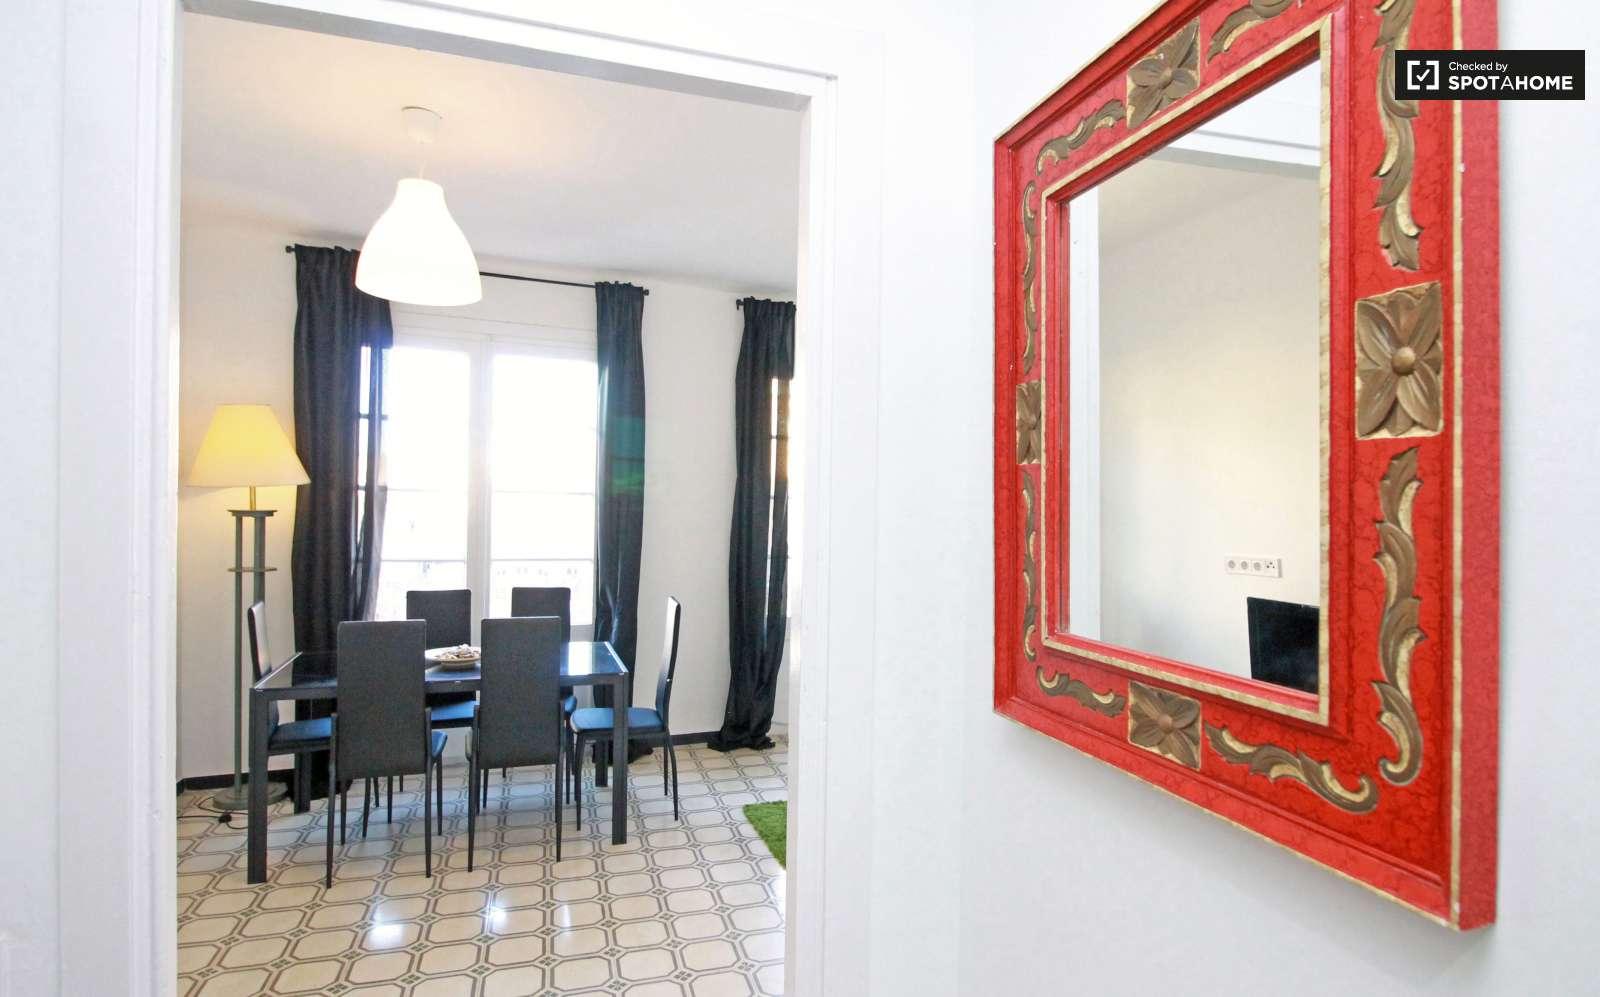 Stylish 2 Bedroom Apartment For Rent Poble Sec Barcelona Ref  # Muebles Poble Sec